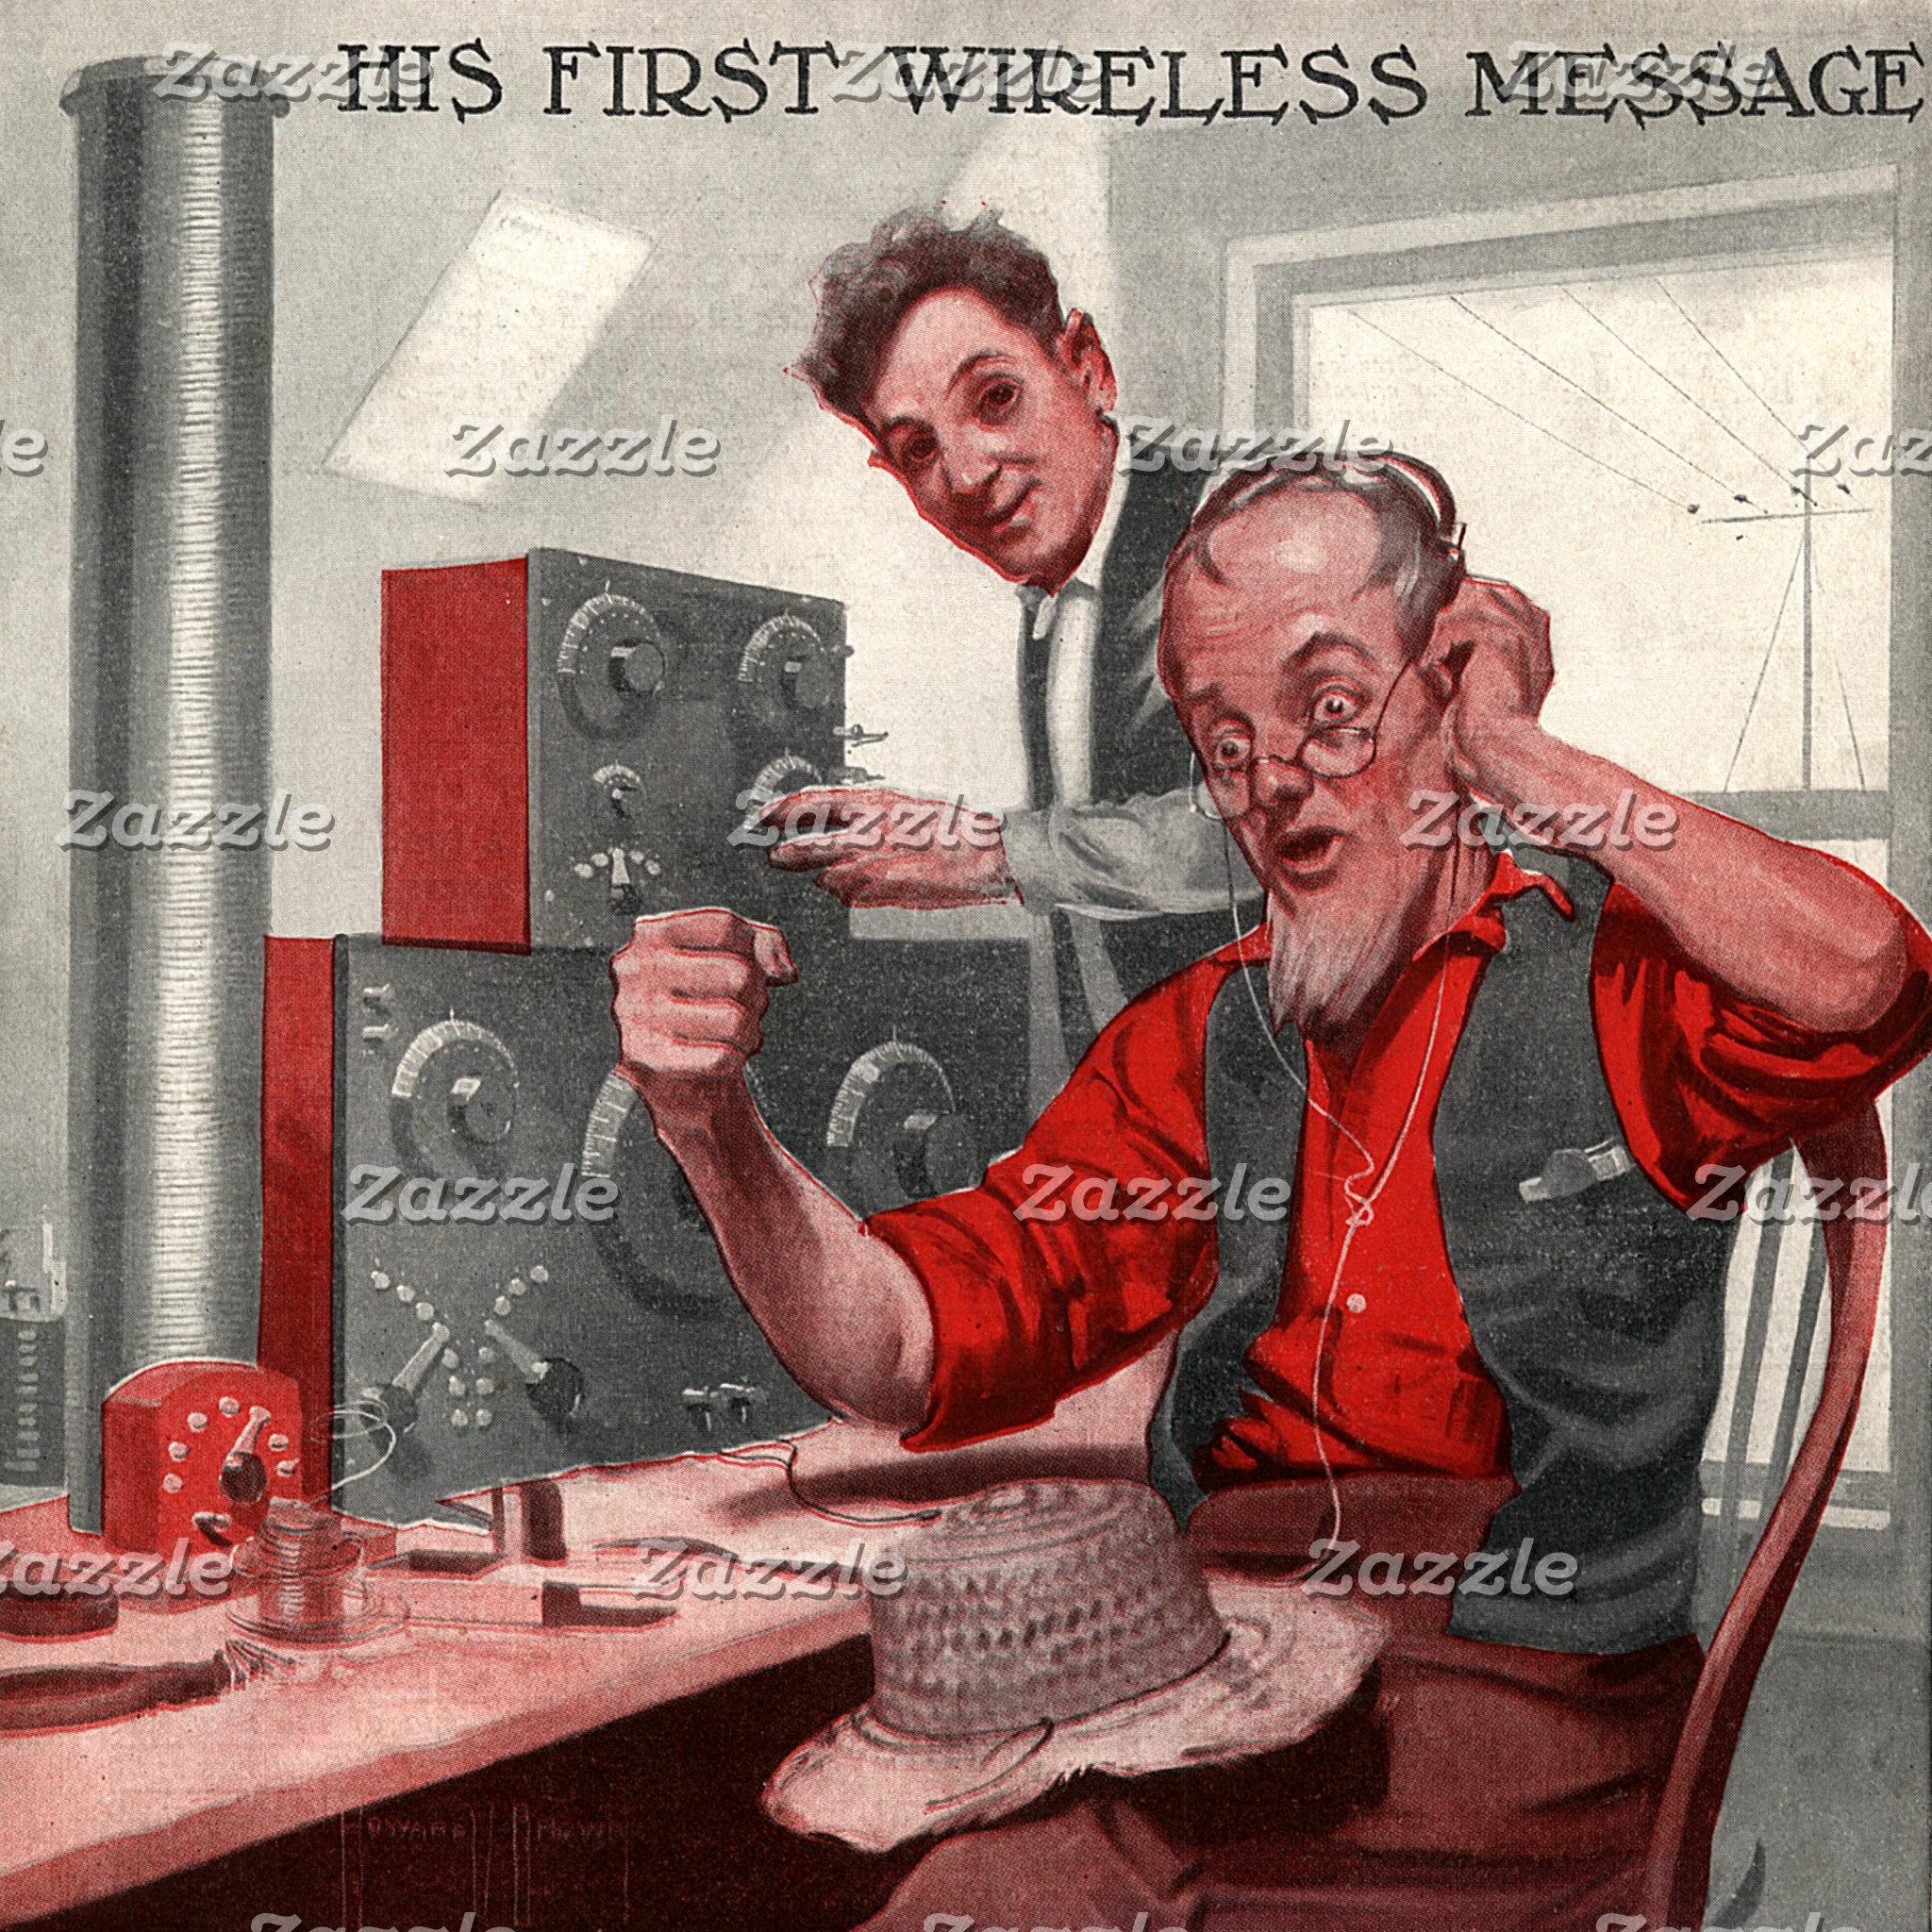 First Wireless Message